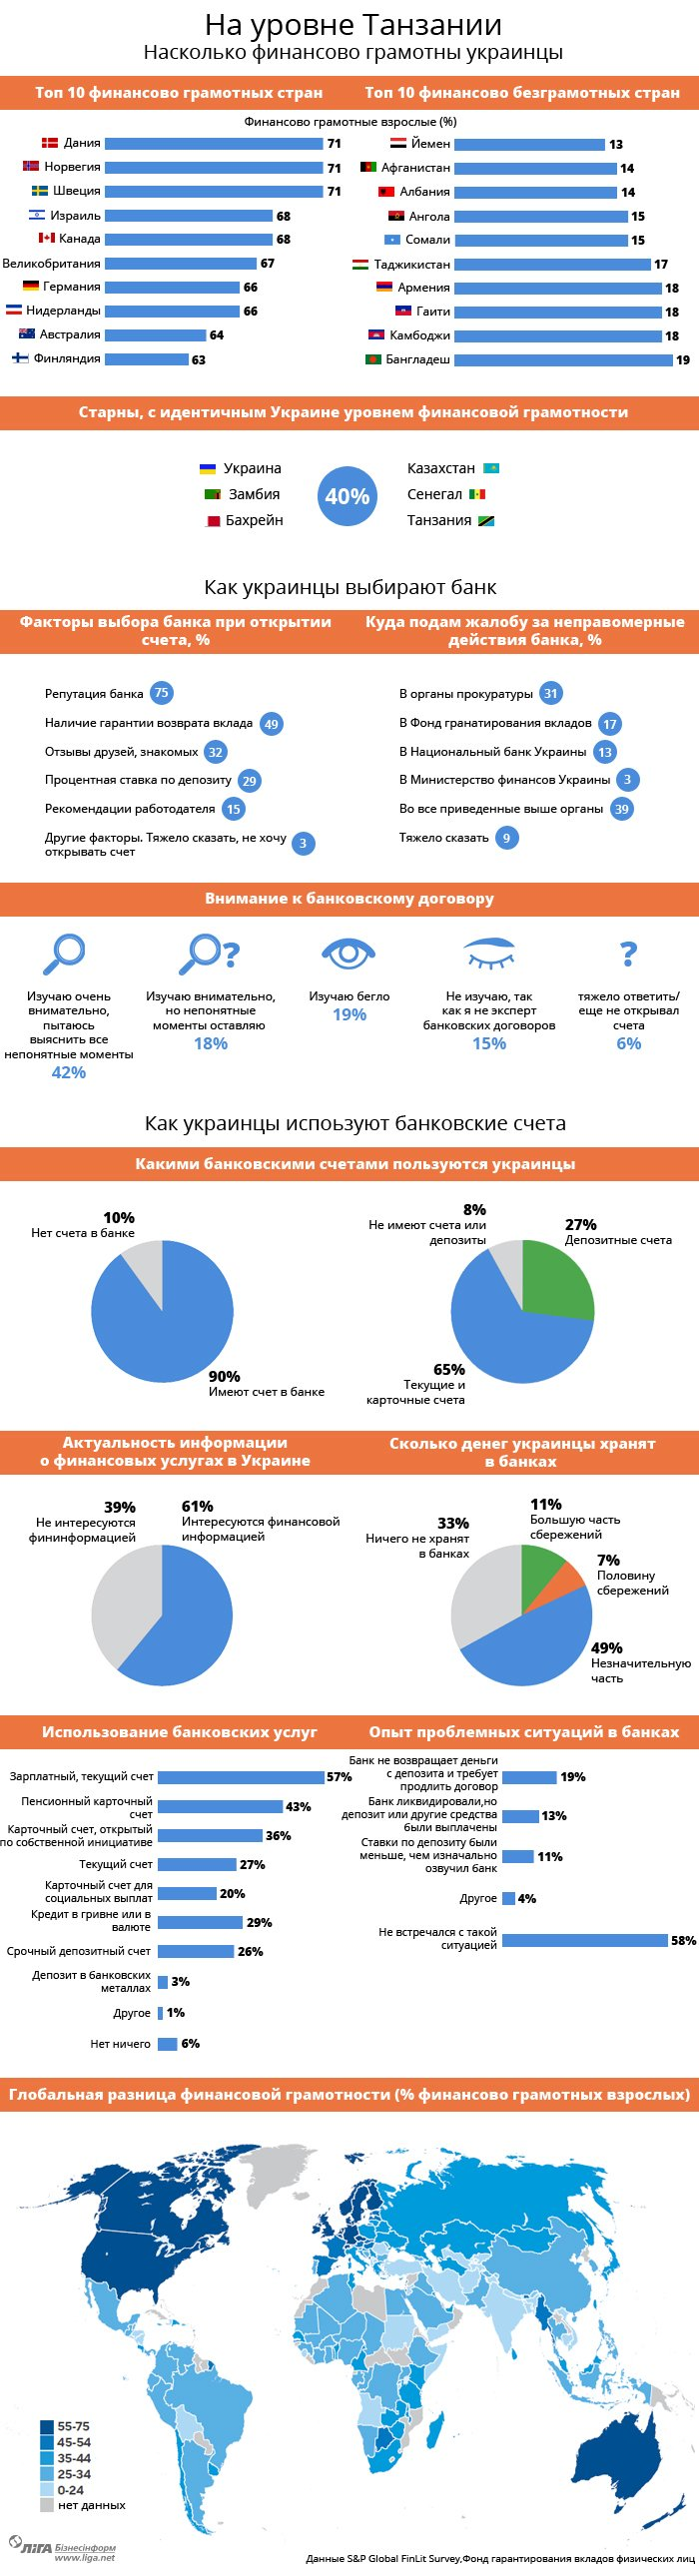 46006_image_infografica